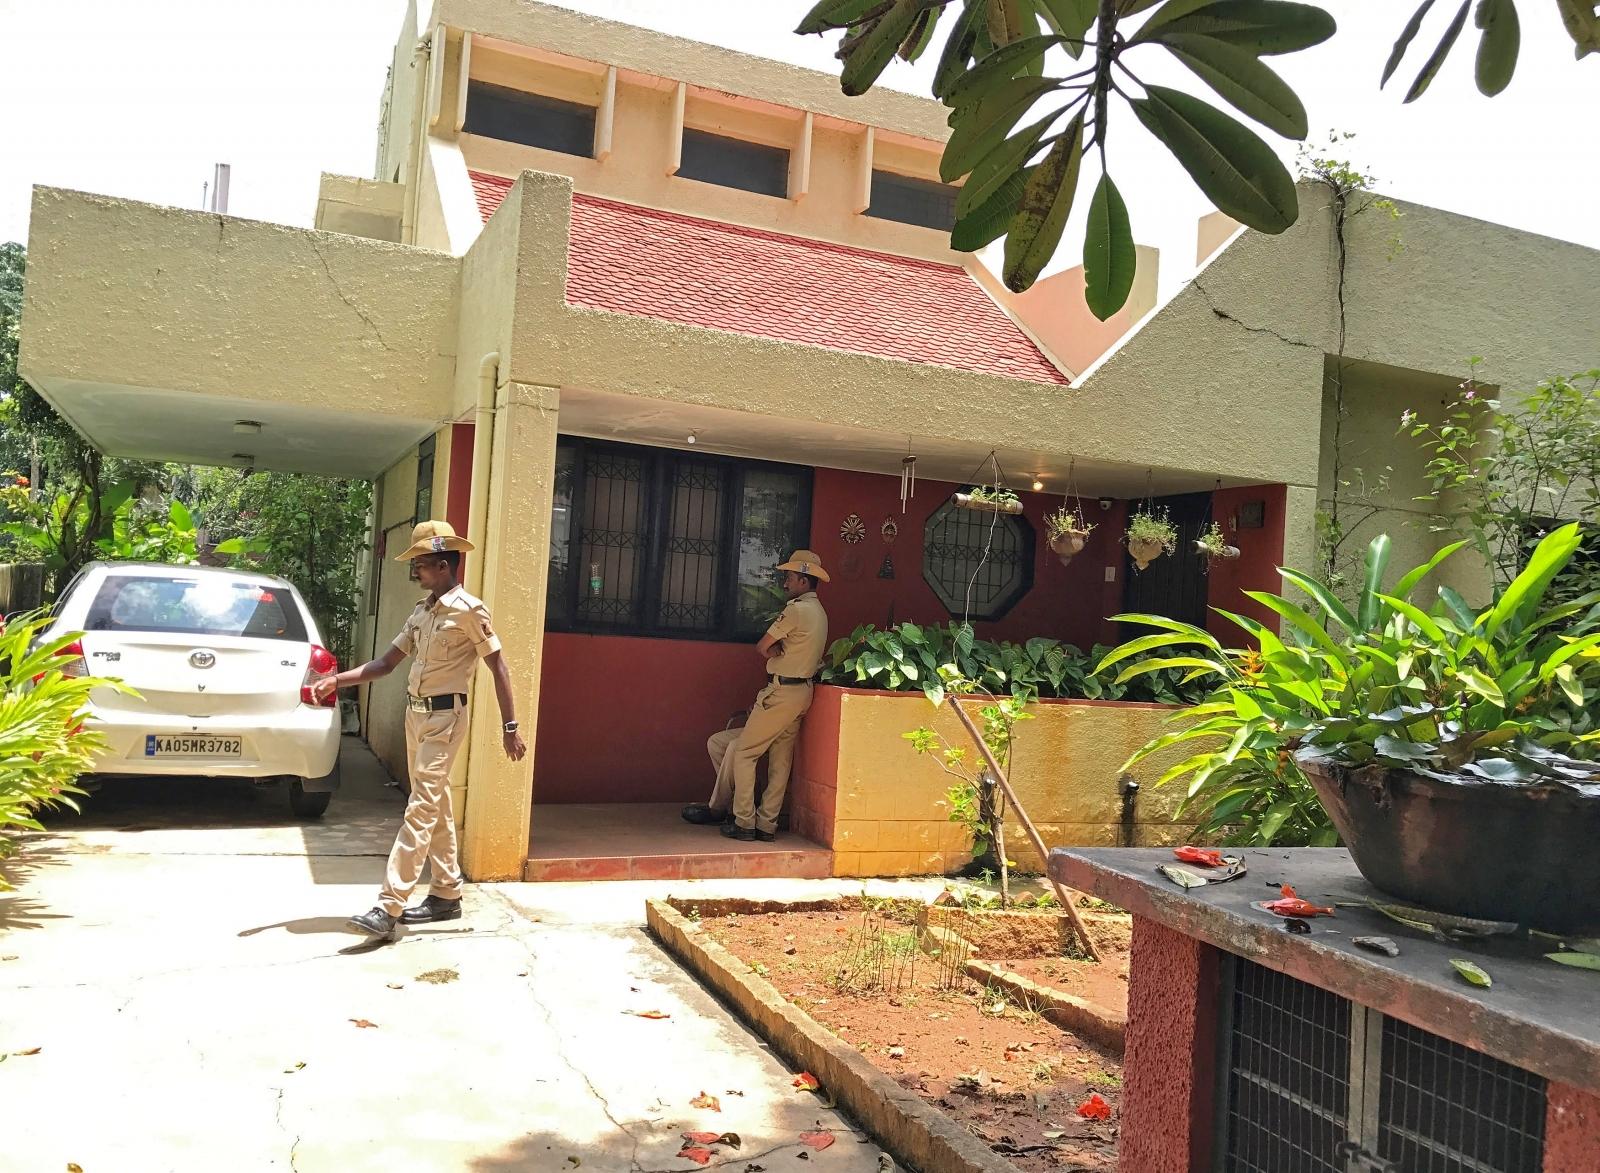 India journalist Gauri Lankesh shot dead